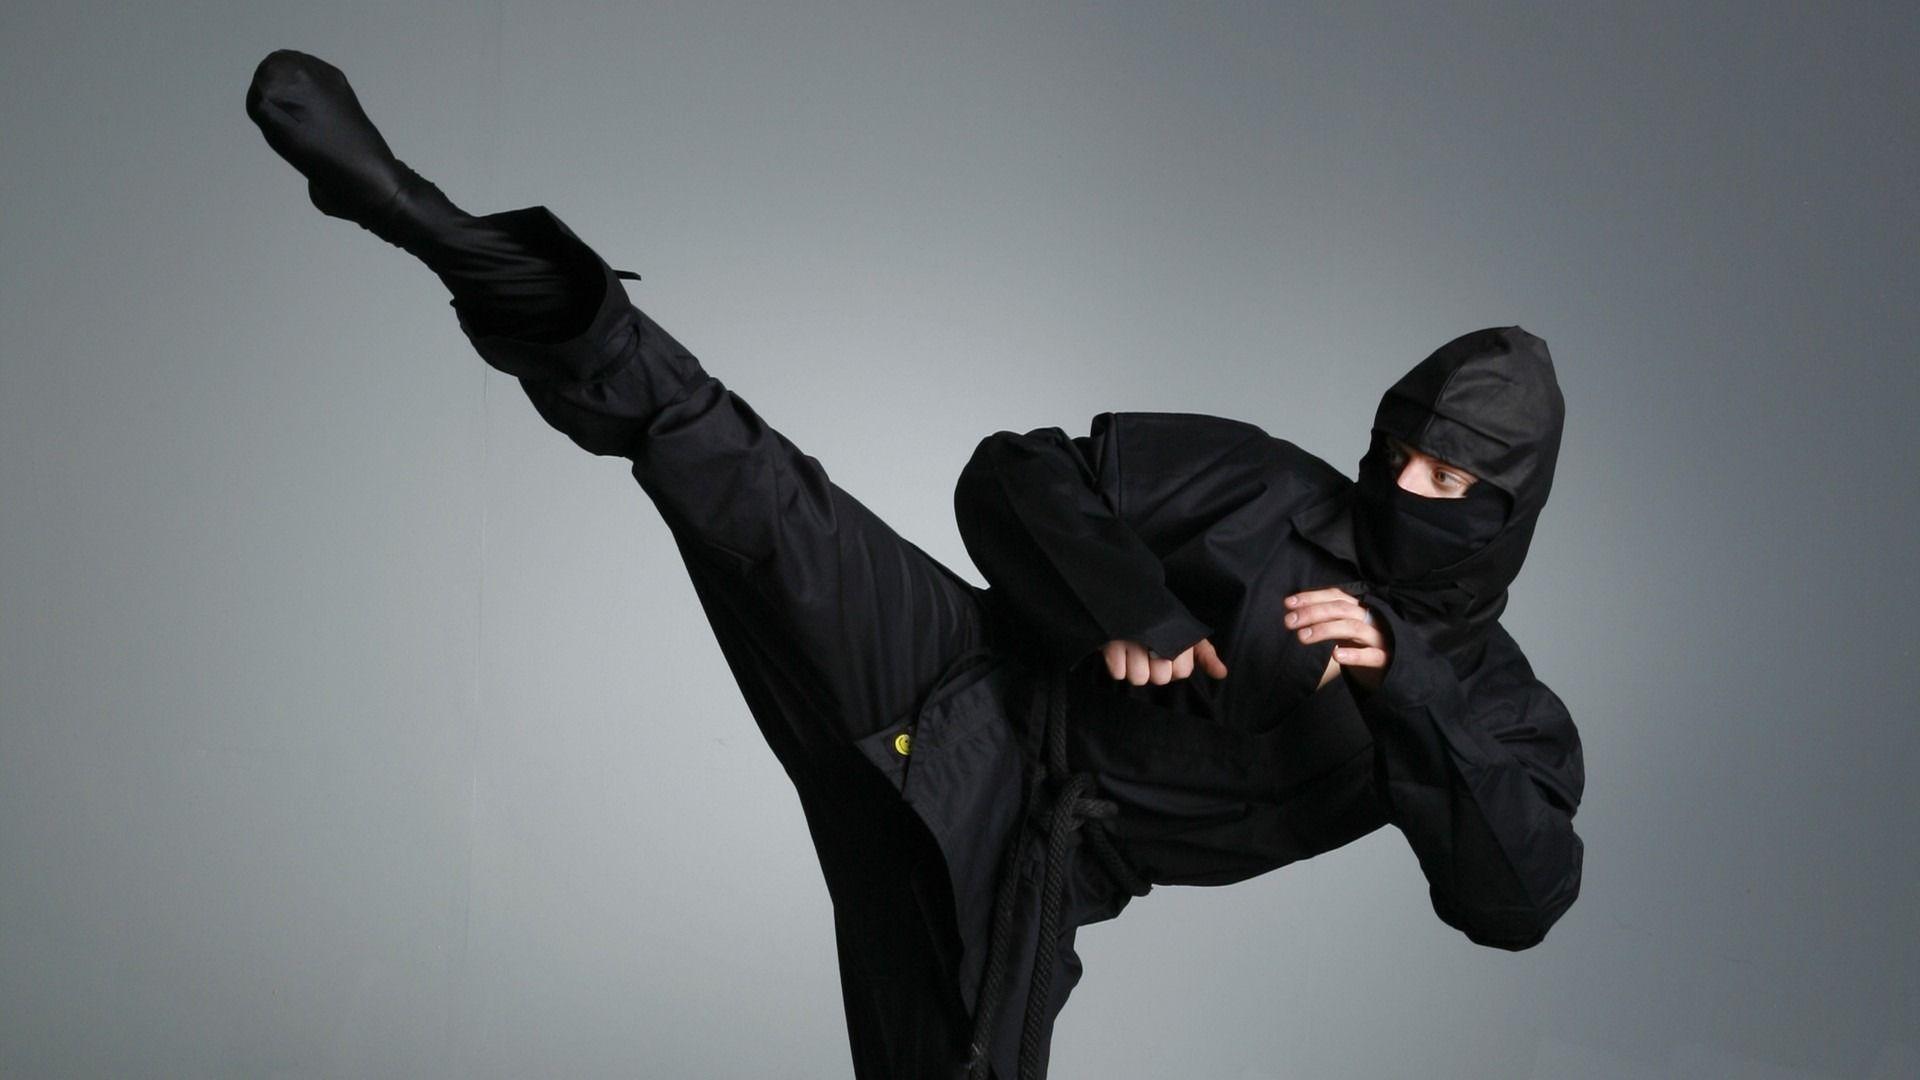 ninja wallpaper 1920x1080